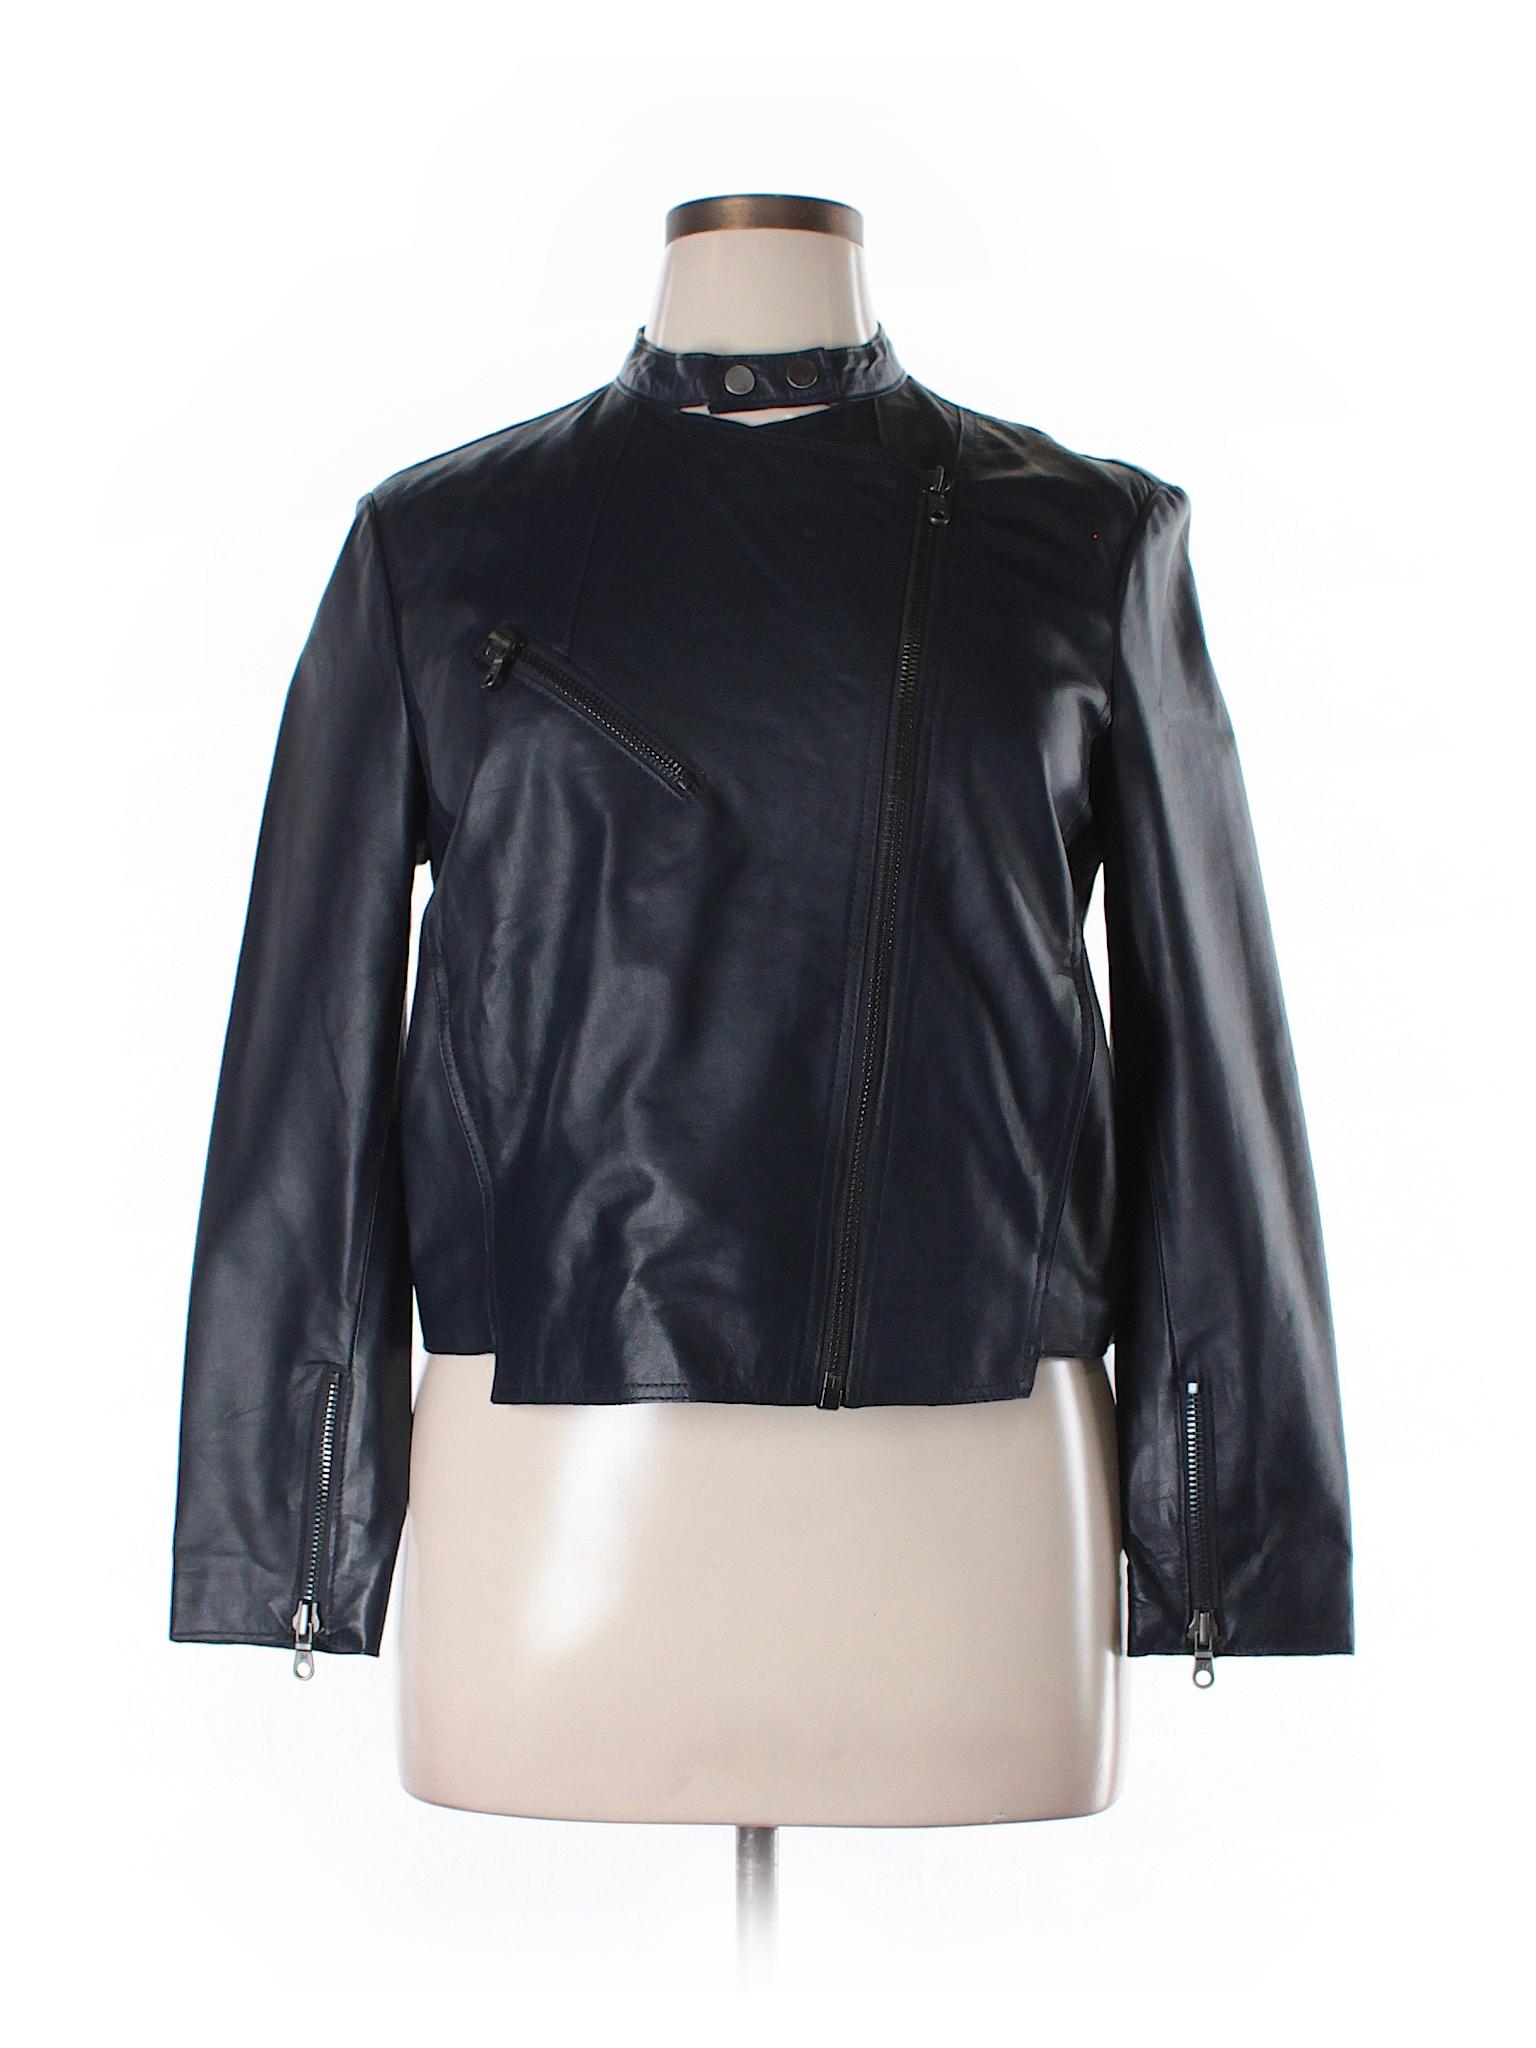 3.1 Phillip Lim For Target Leather Jacket - 62% Off Only On ThredUP